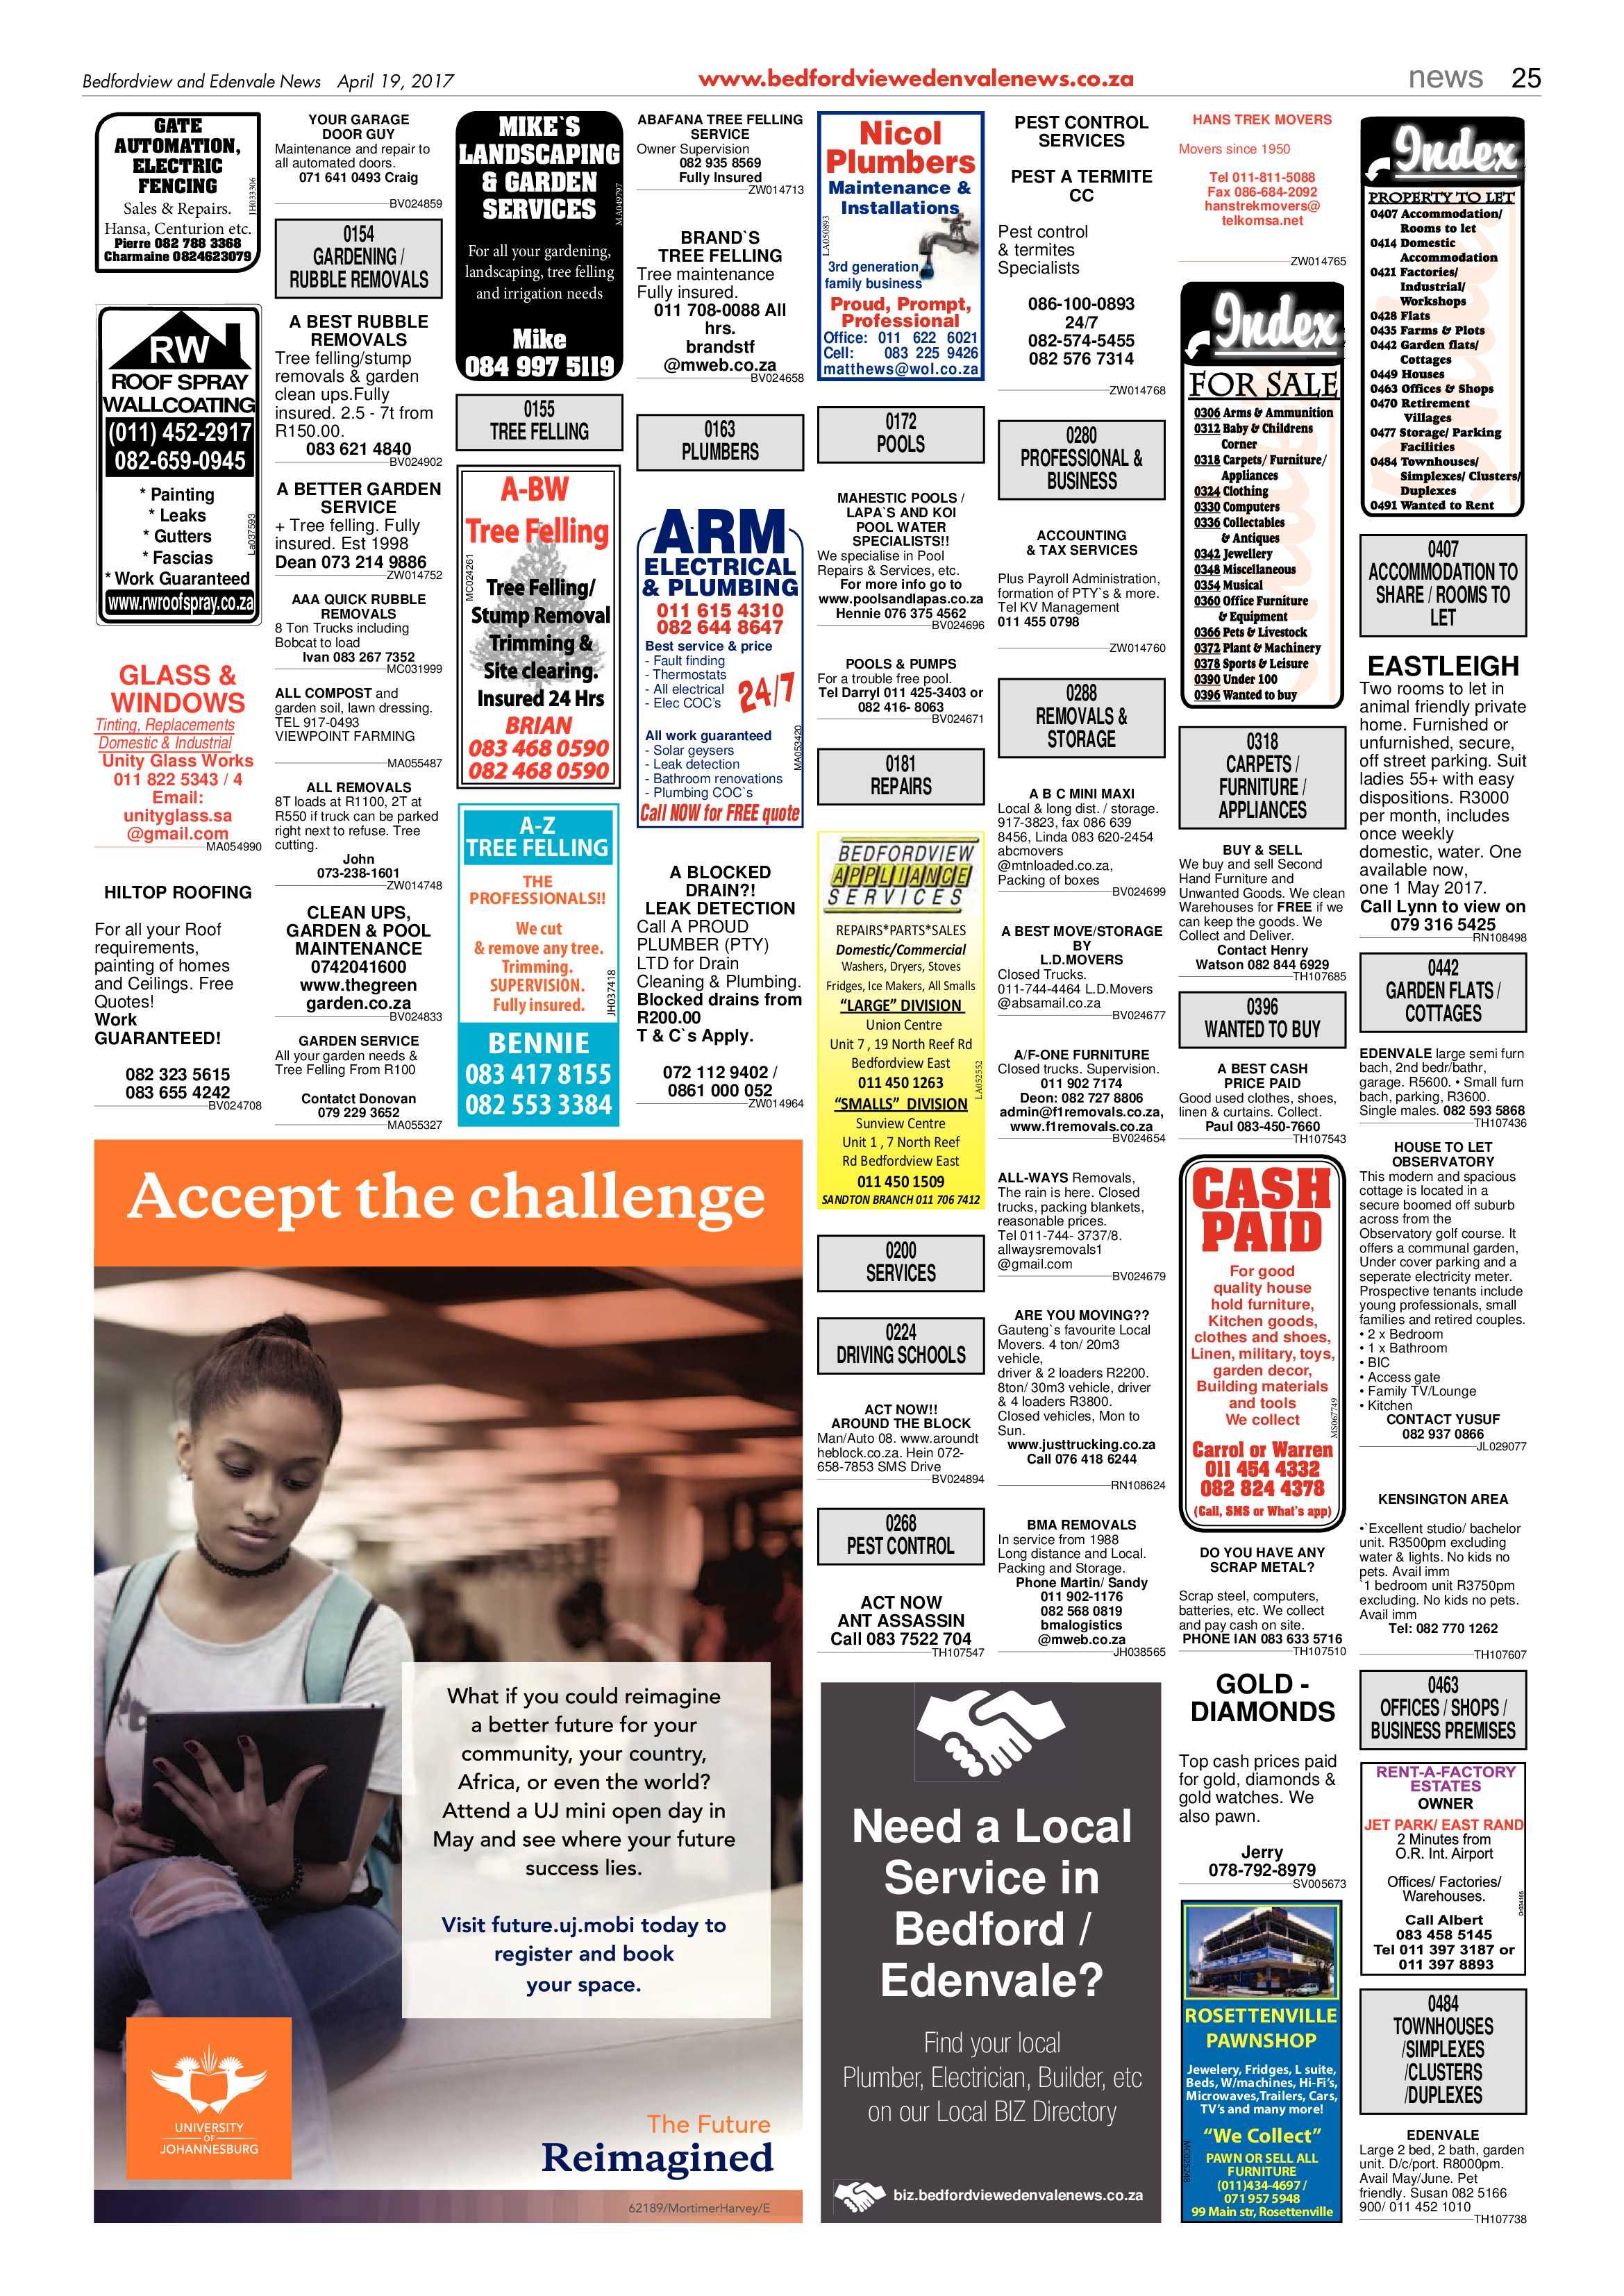 bedfordview-edenvale-news-19-april-2017-epapers-page-25